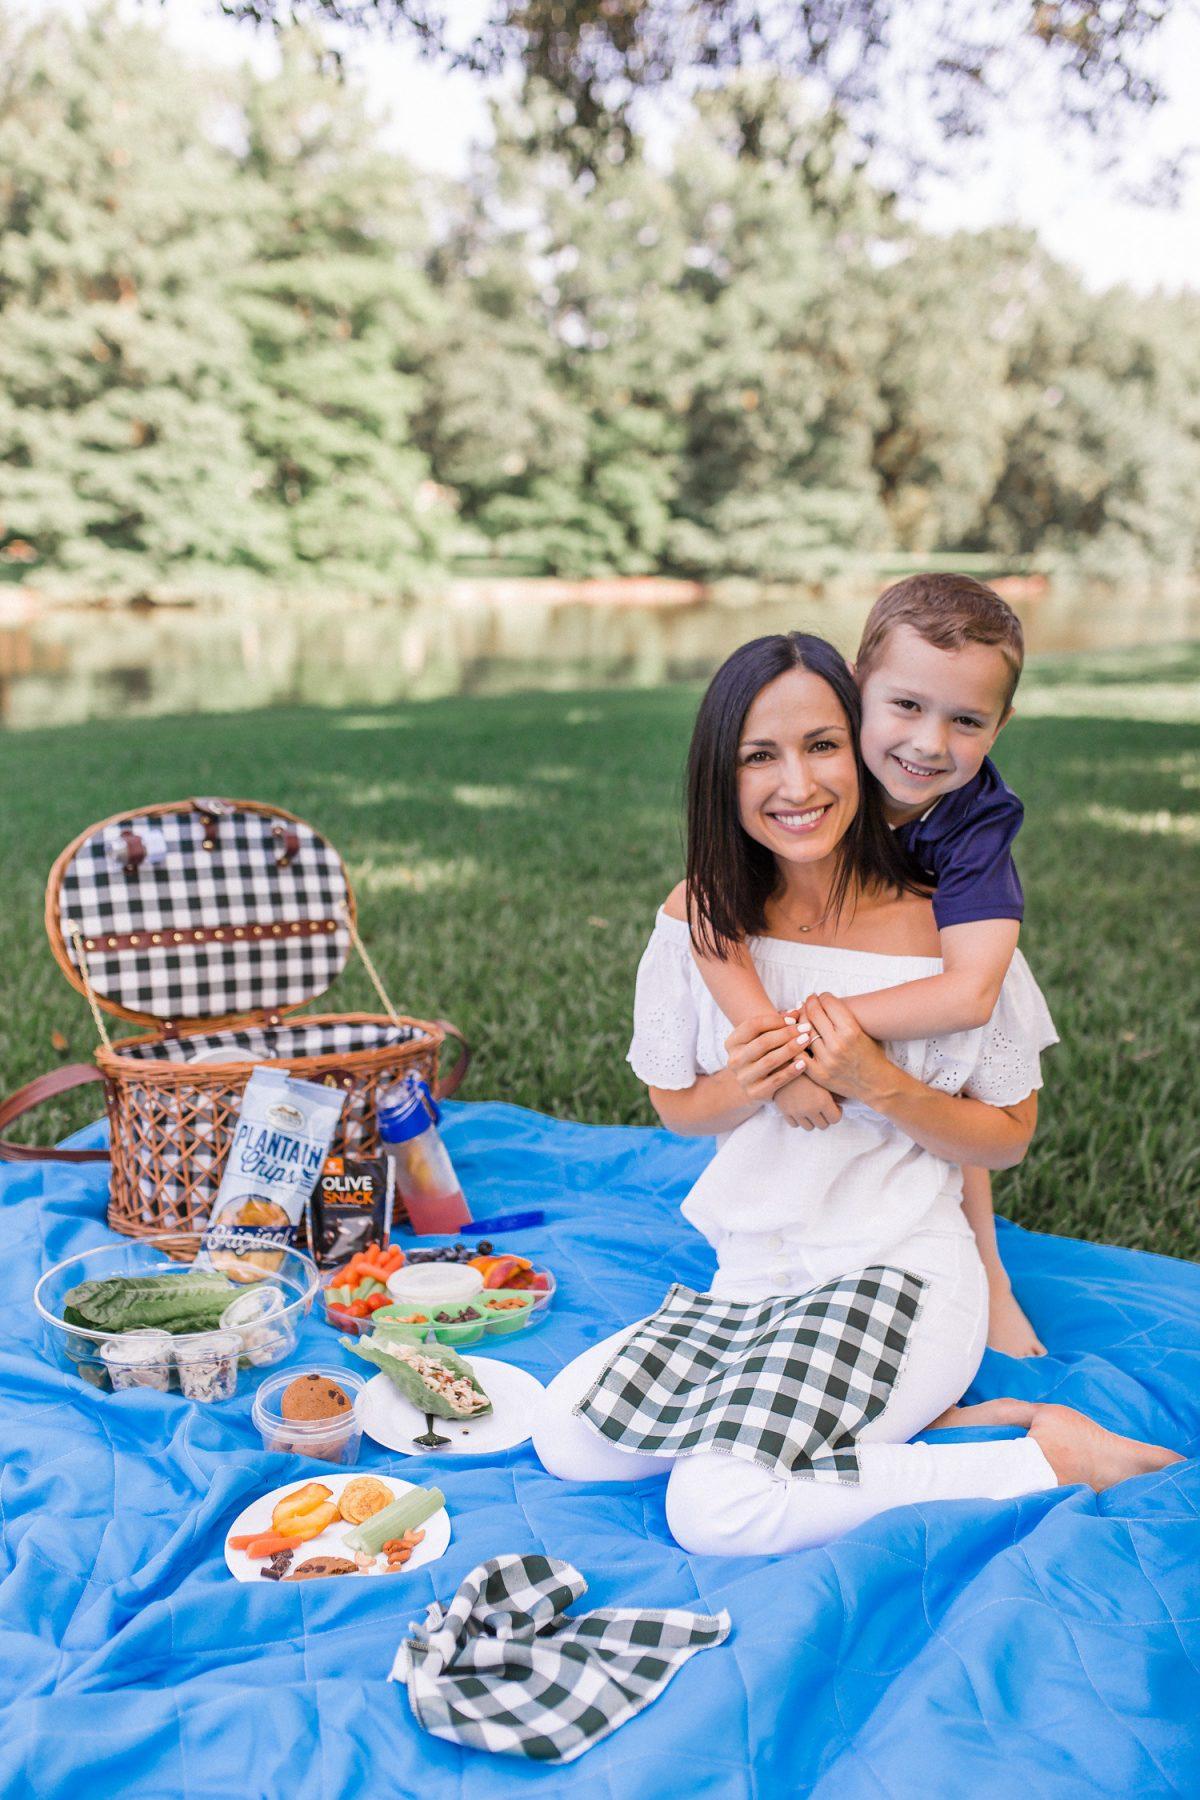 A Healthy (Kid-Friendly!) Paleo Picnic Basket